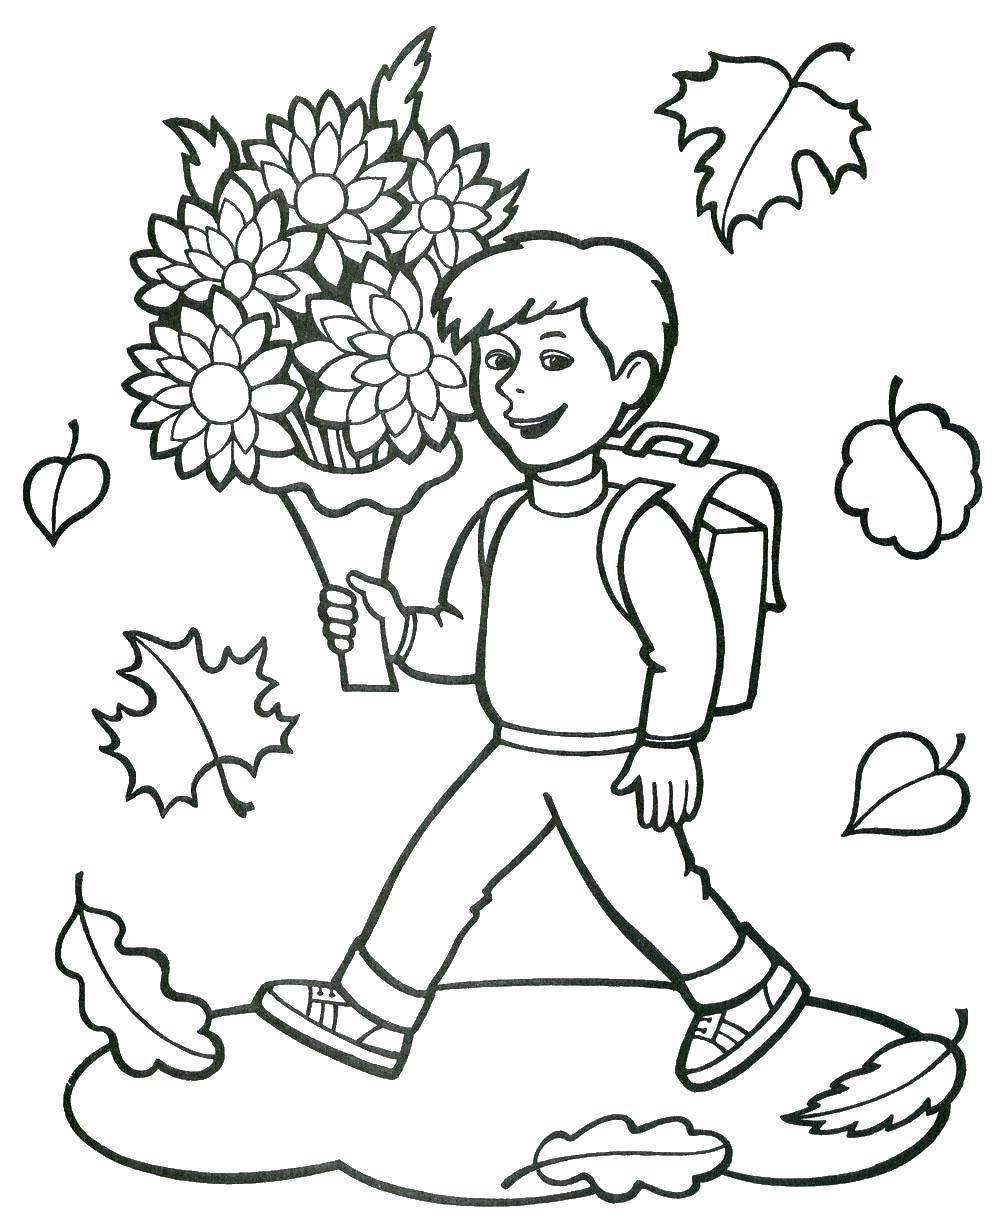 Раскраски веточка, Раскраска Веточка с листиками осень.